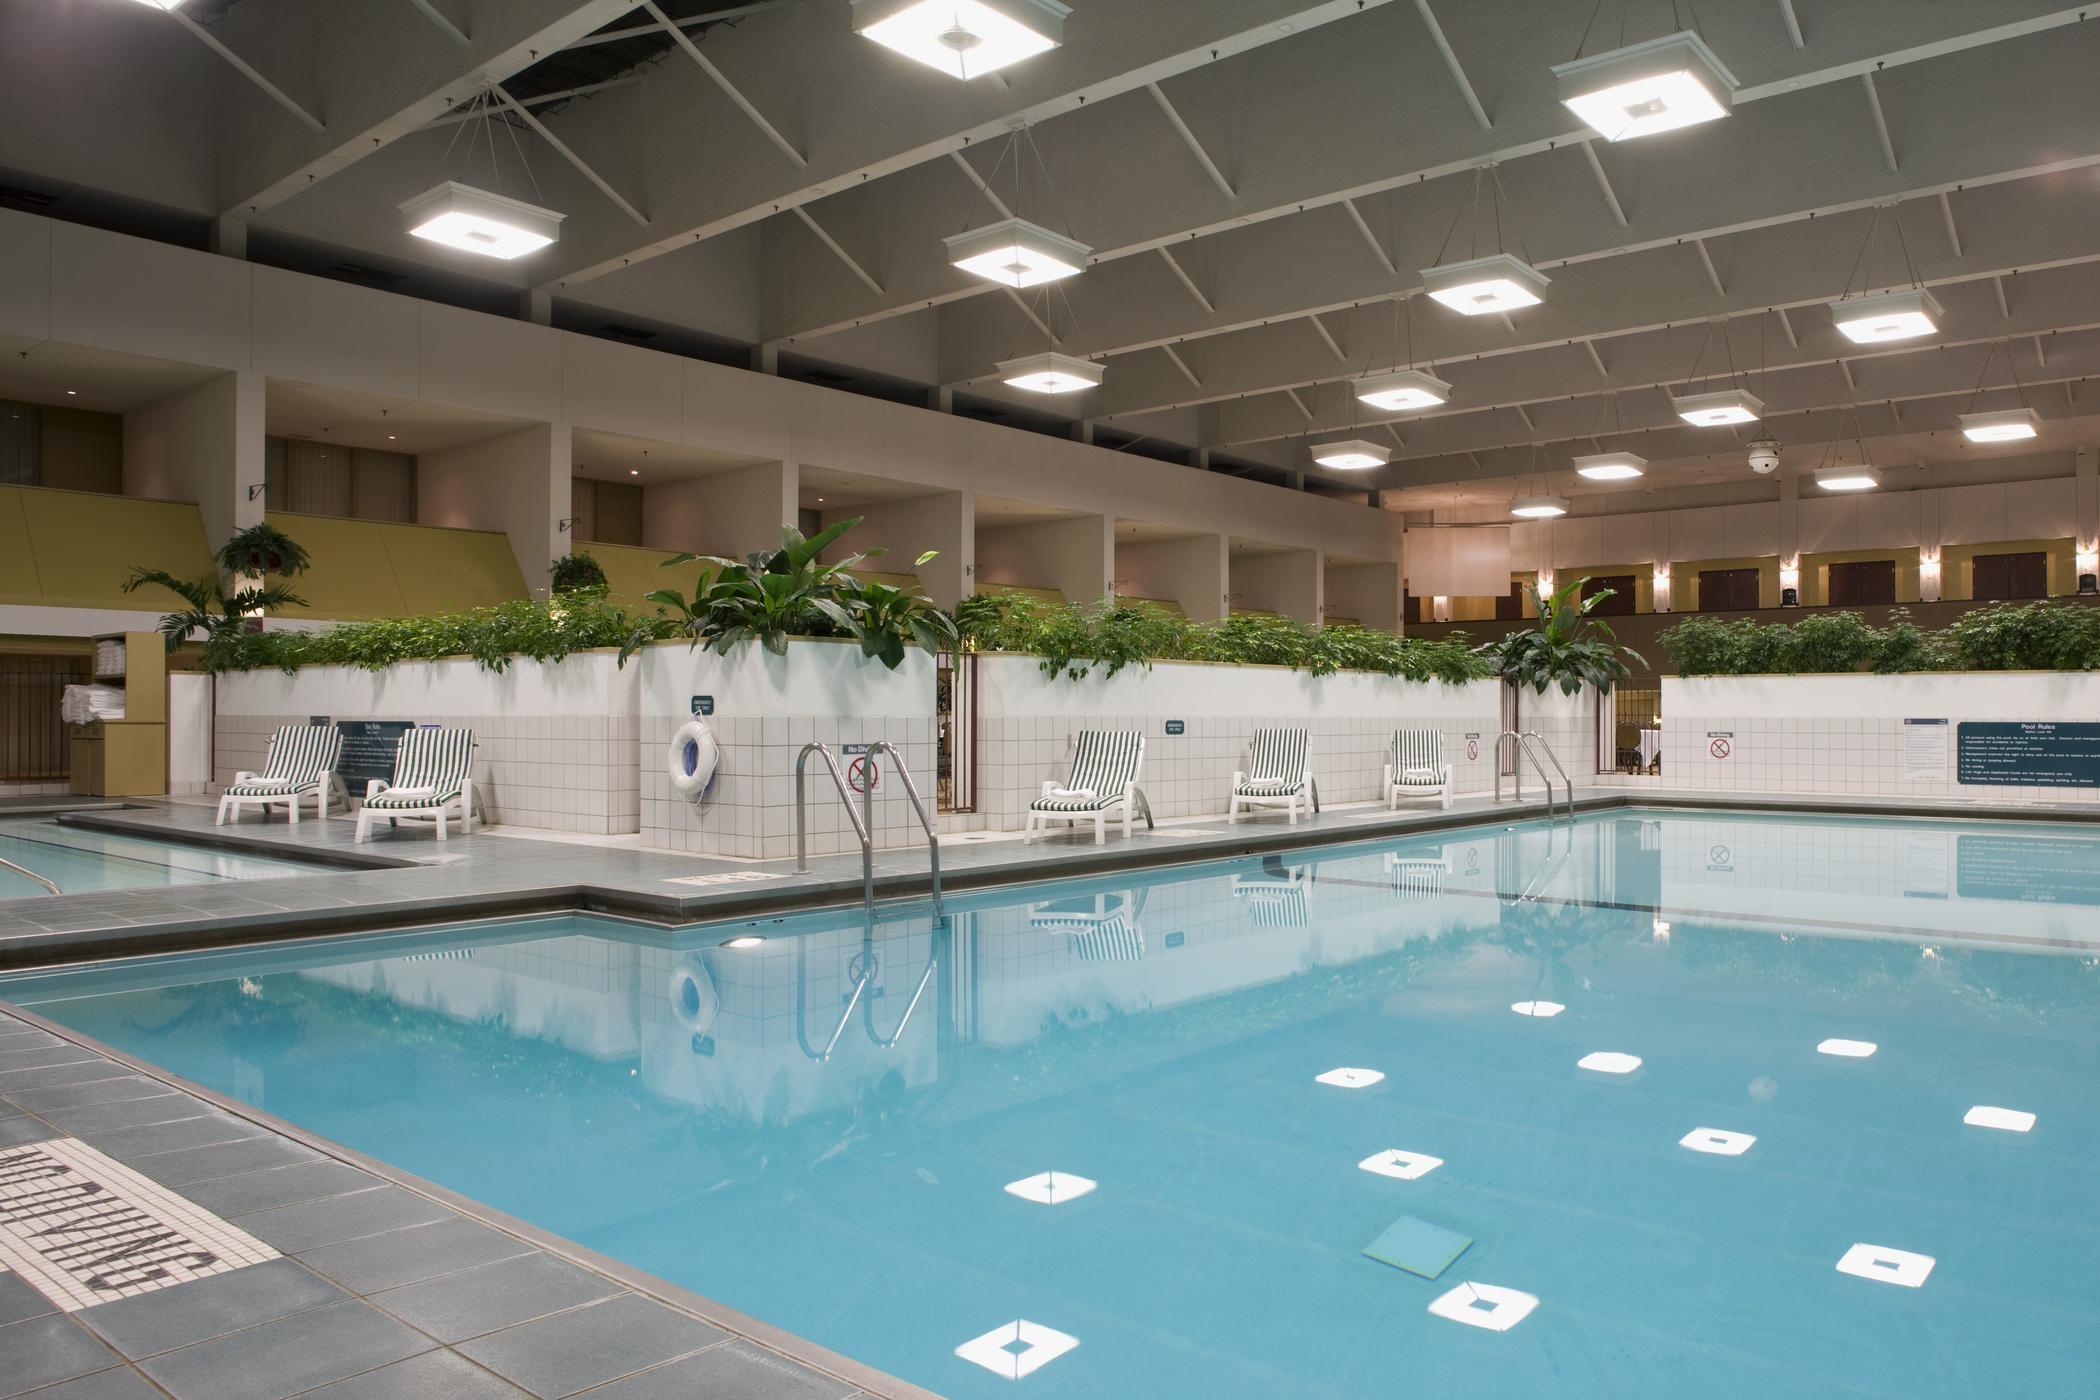 Doubletree By Hilton Hotel Bloomington Smart Meetings